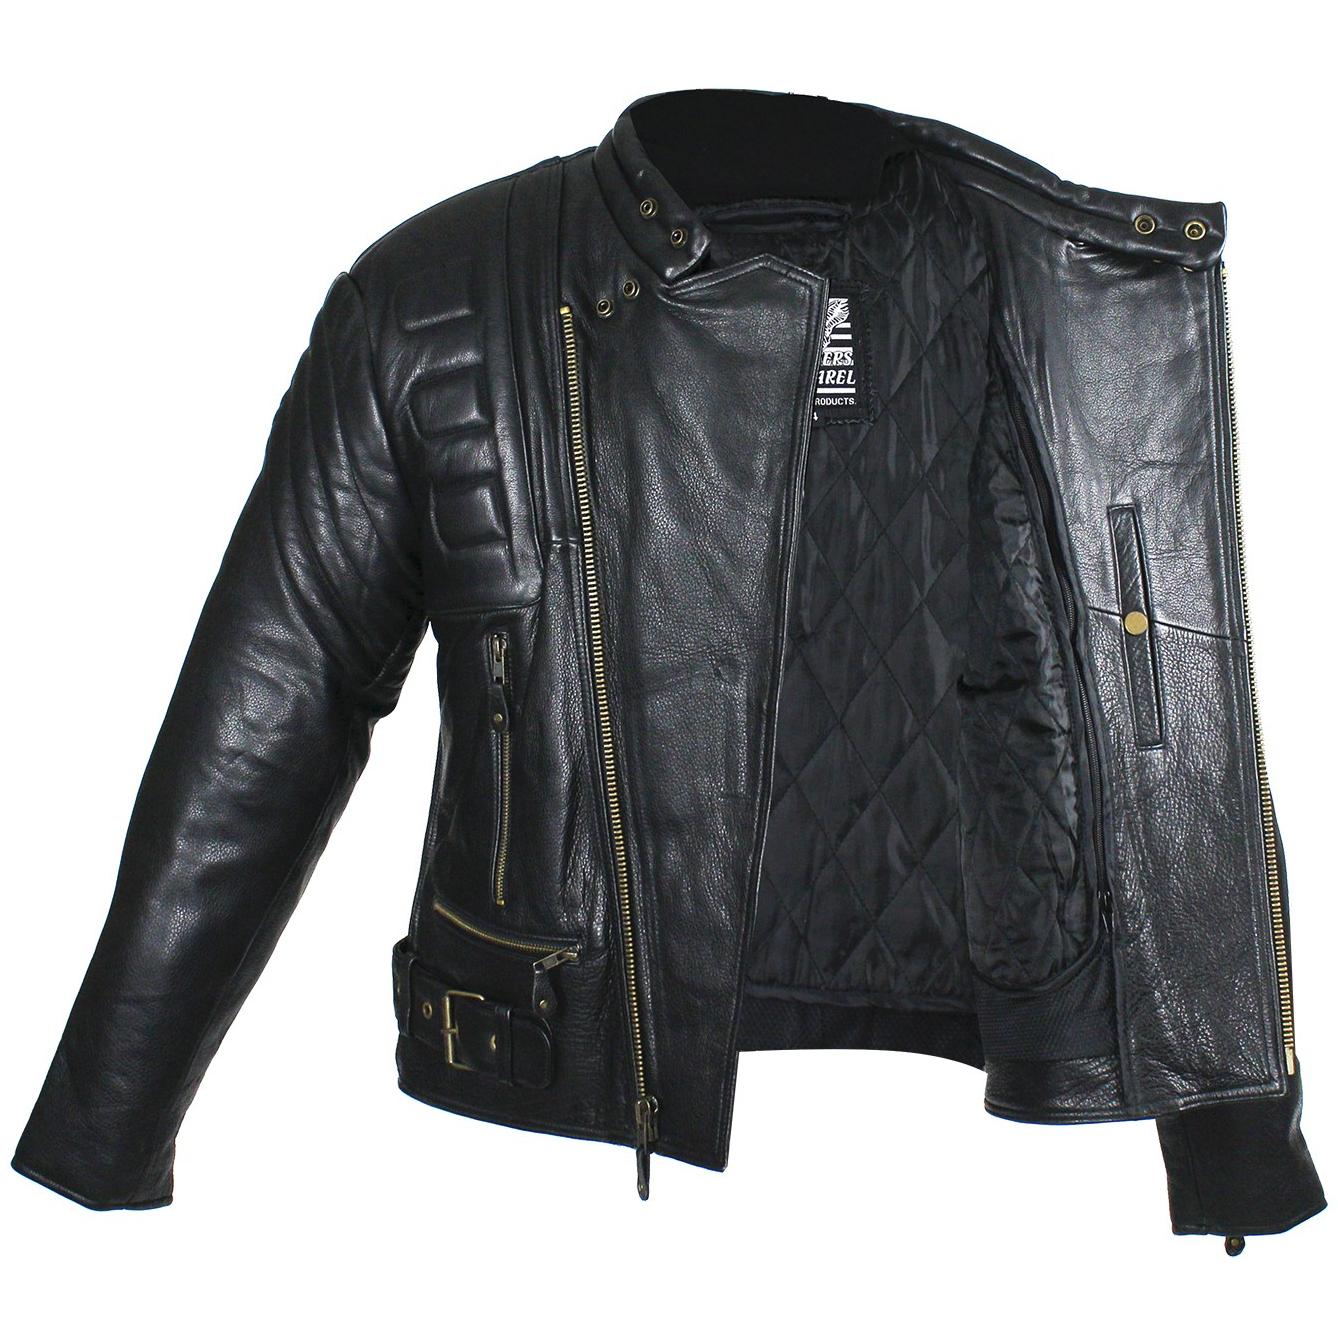 Mens Leather Padded Racer Style Motorcycle Jacket Mlsj19